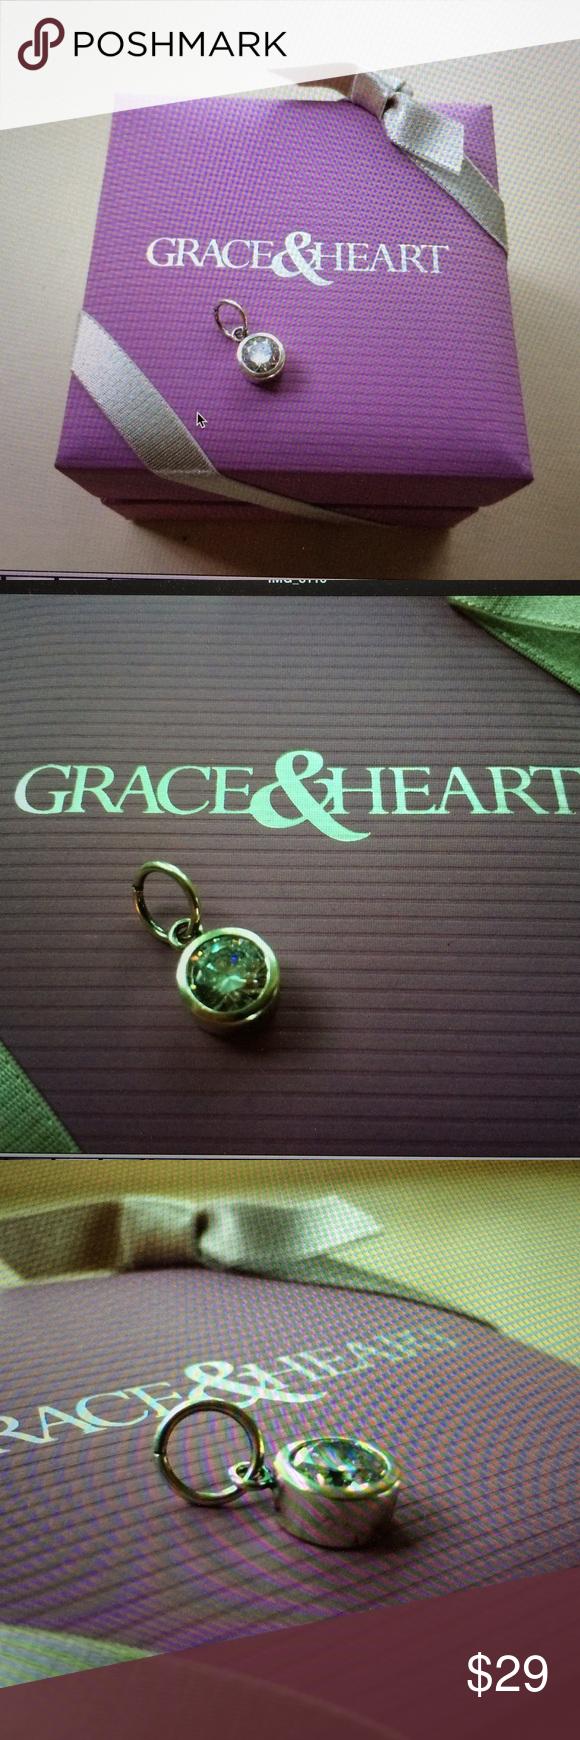 "Grace & Heart April Birth Charm Grace & Heart April Fiery Birth Charm. Clear CZ, Sterling 925.dia 3/8"". Current Catalog. EUC, #P1098SSAPR Grace & Heart Jewelry"